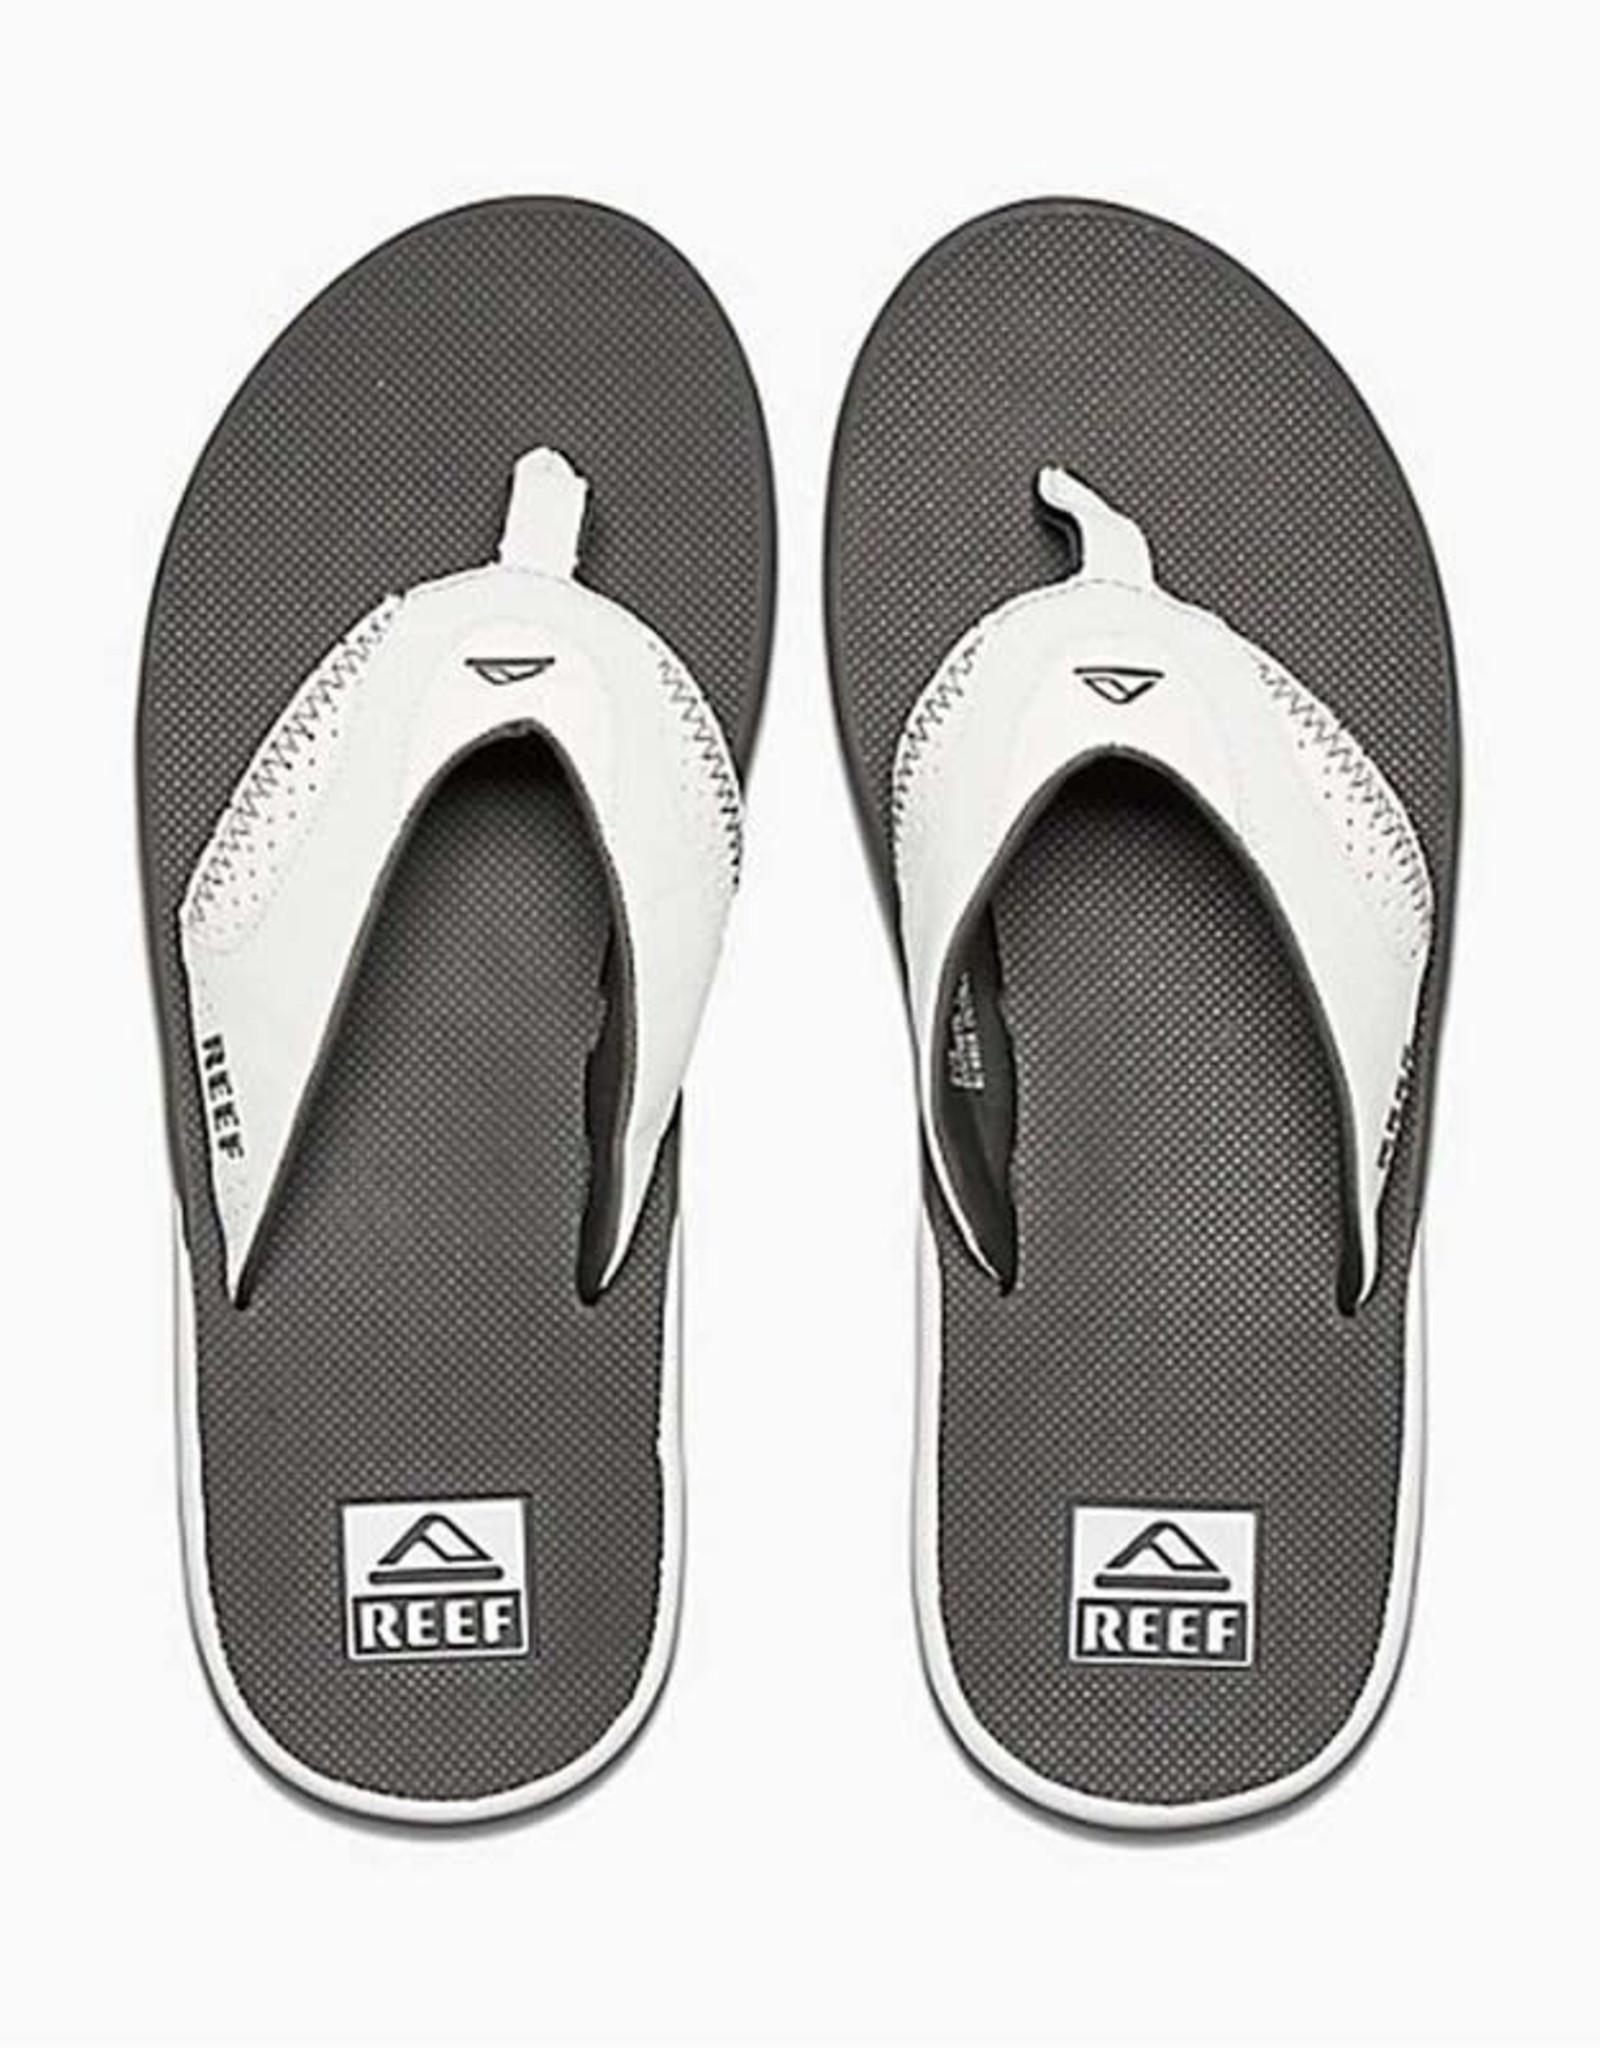 Reef REEF - FANNING Sandal - Grey -